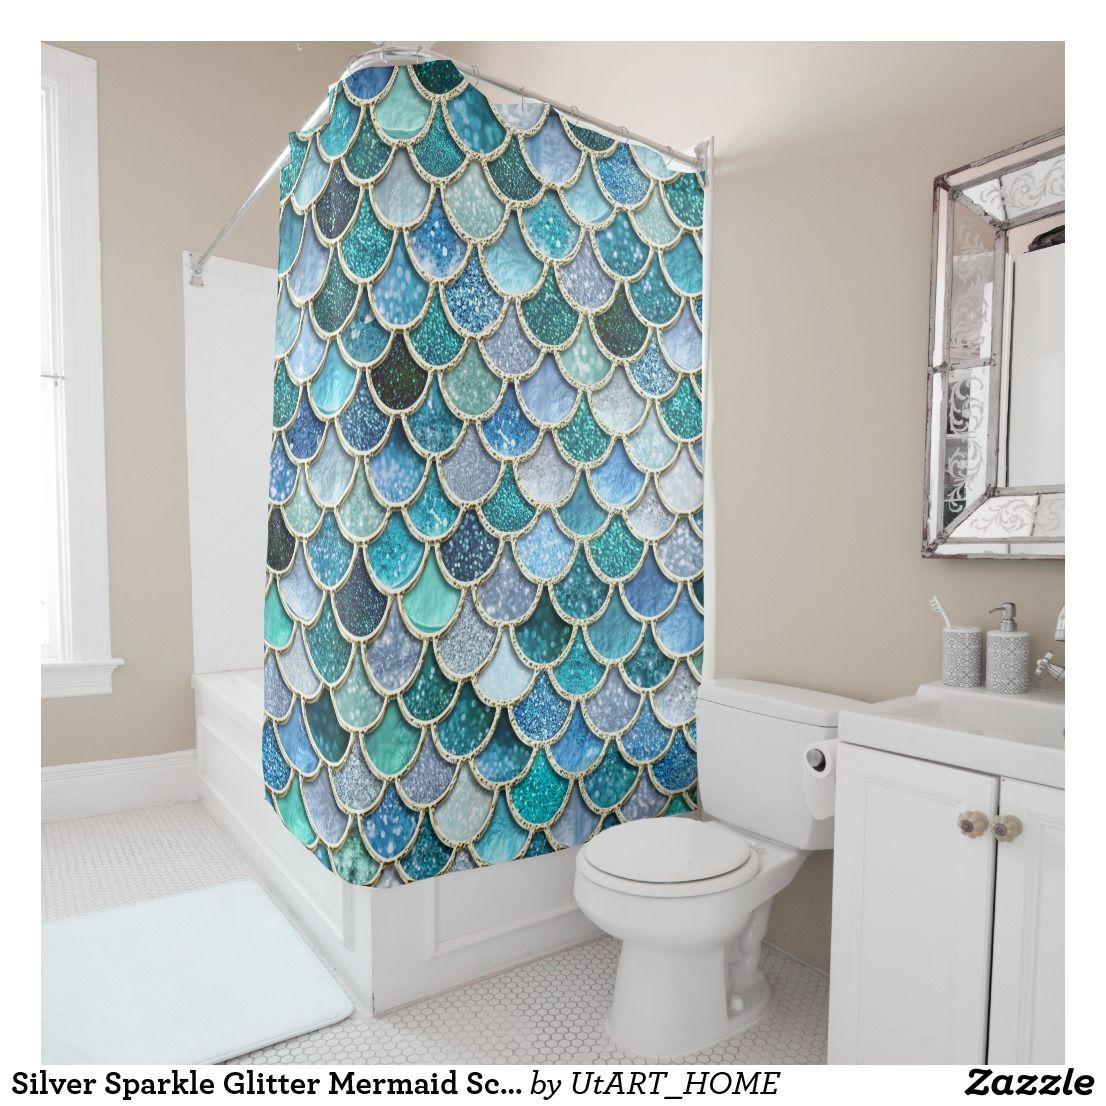 Silver Sparkle Glitter Mermaid Scales Shower Curtain Zazzle Com